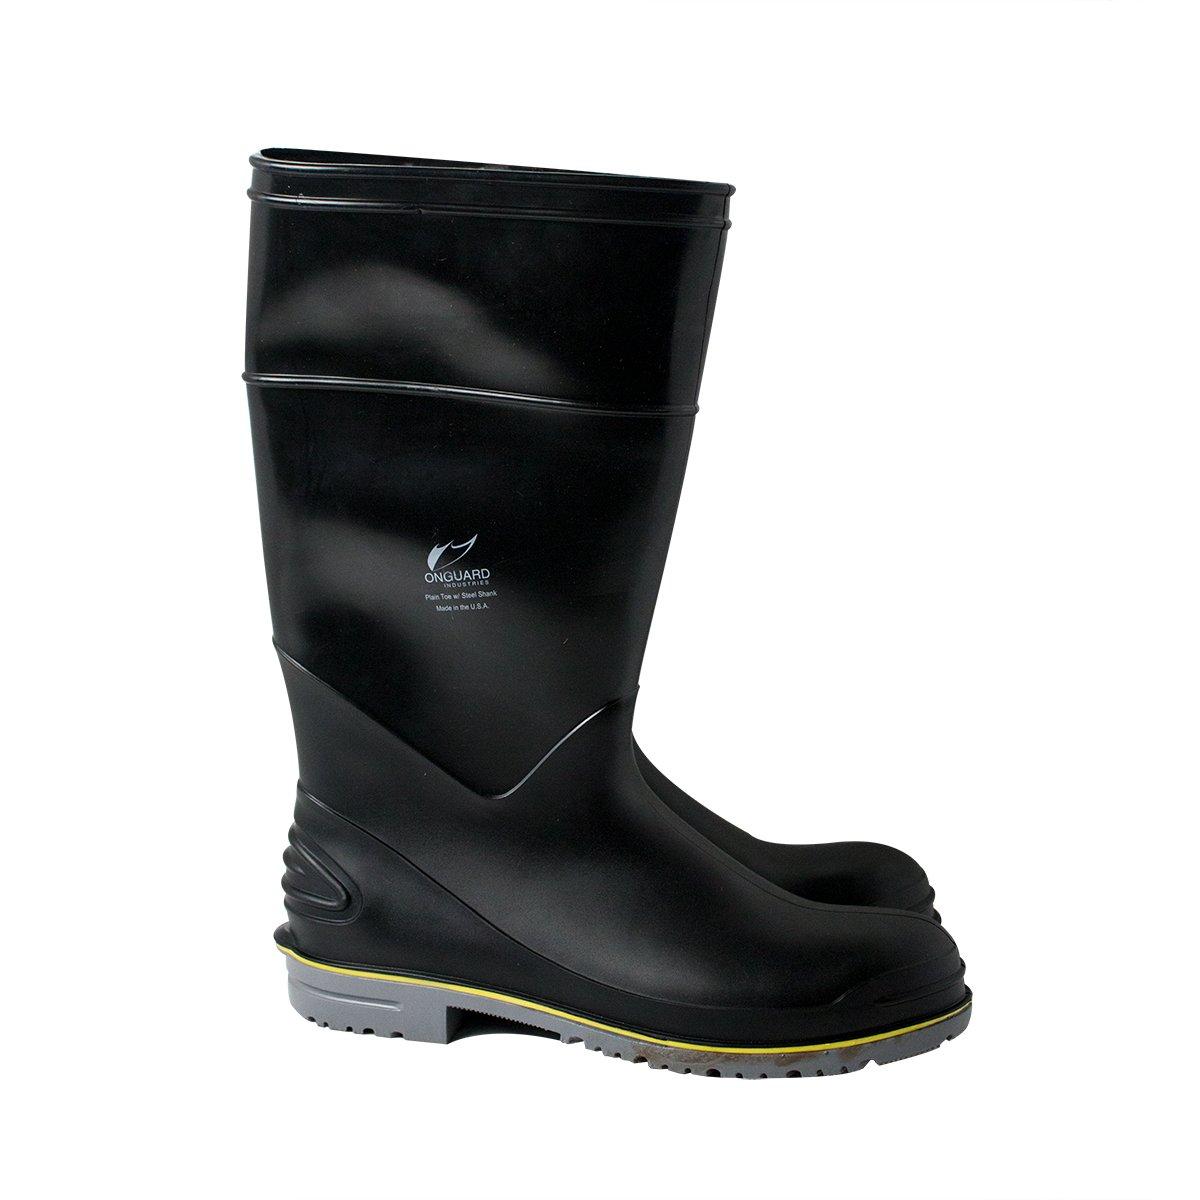 "UltraSource 440064-12 Flex 3 PVC Boots, 16"", Black, Soft Toe, Size 12"